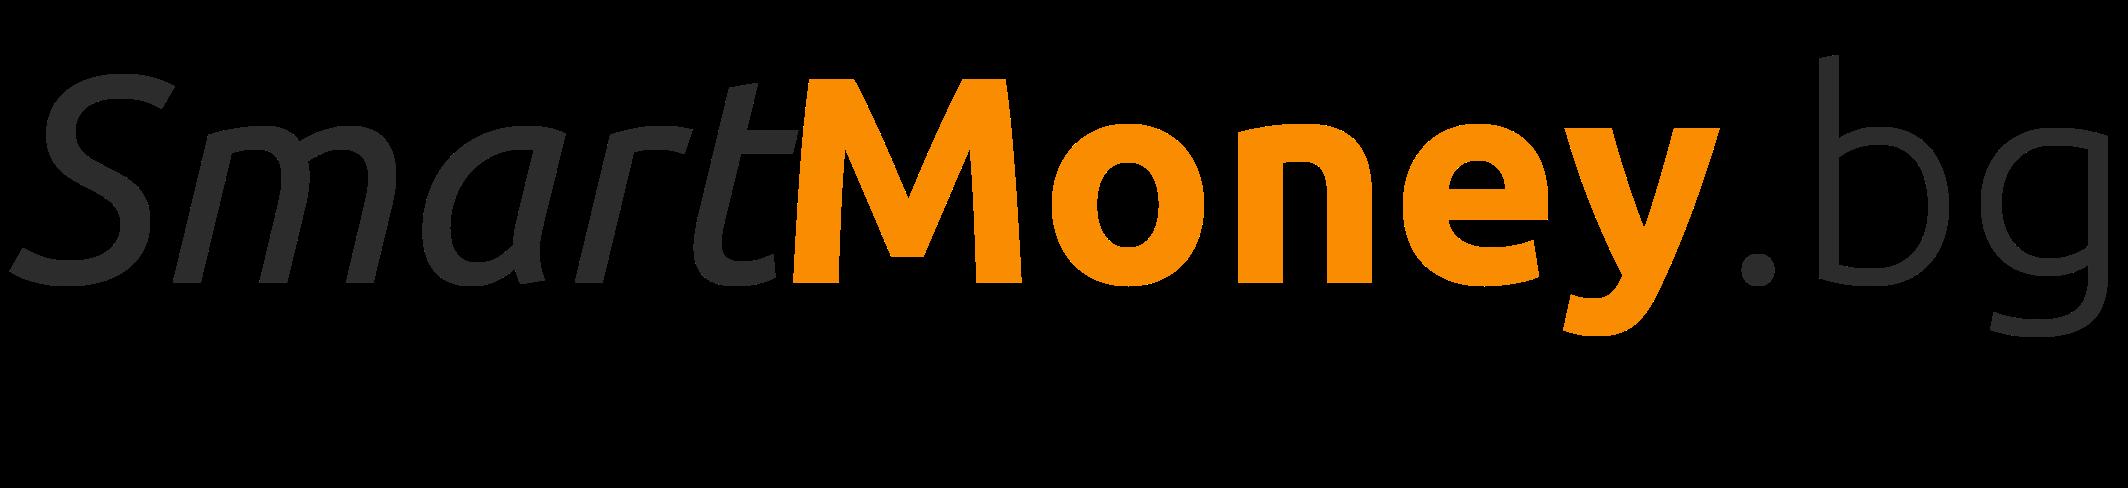 SmartMoney_logo